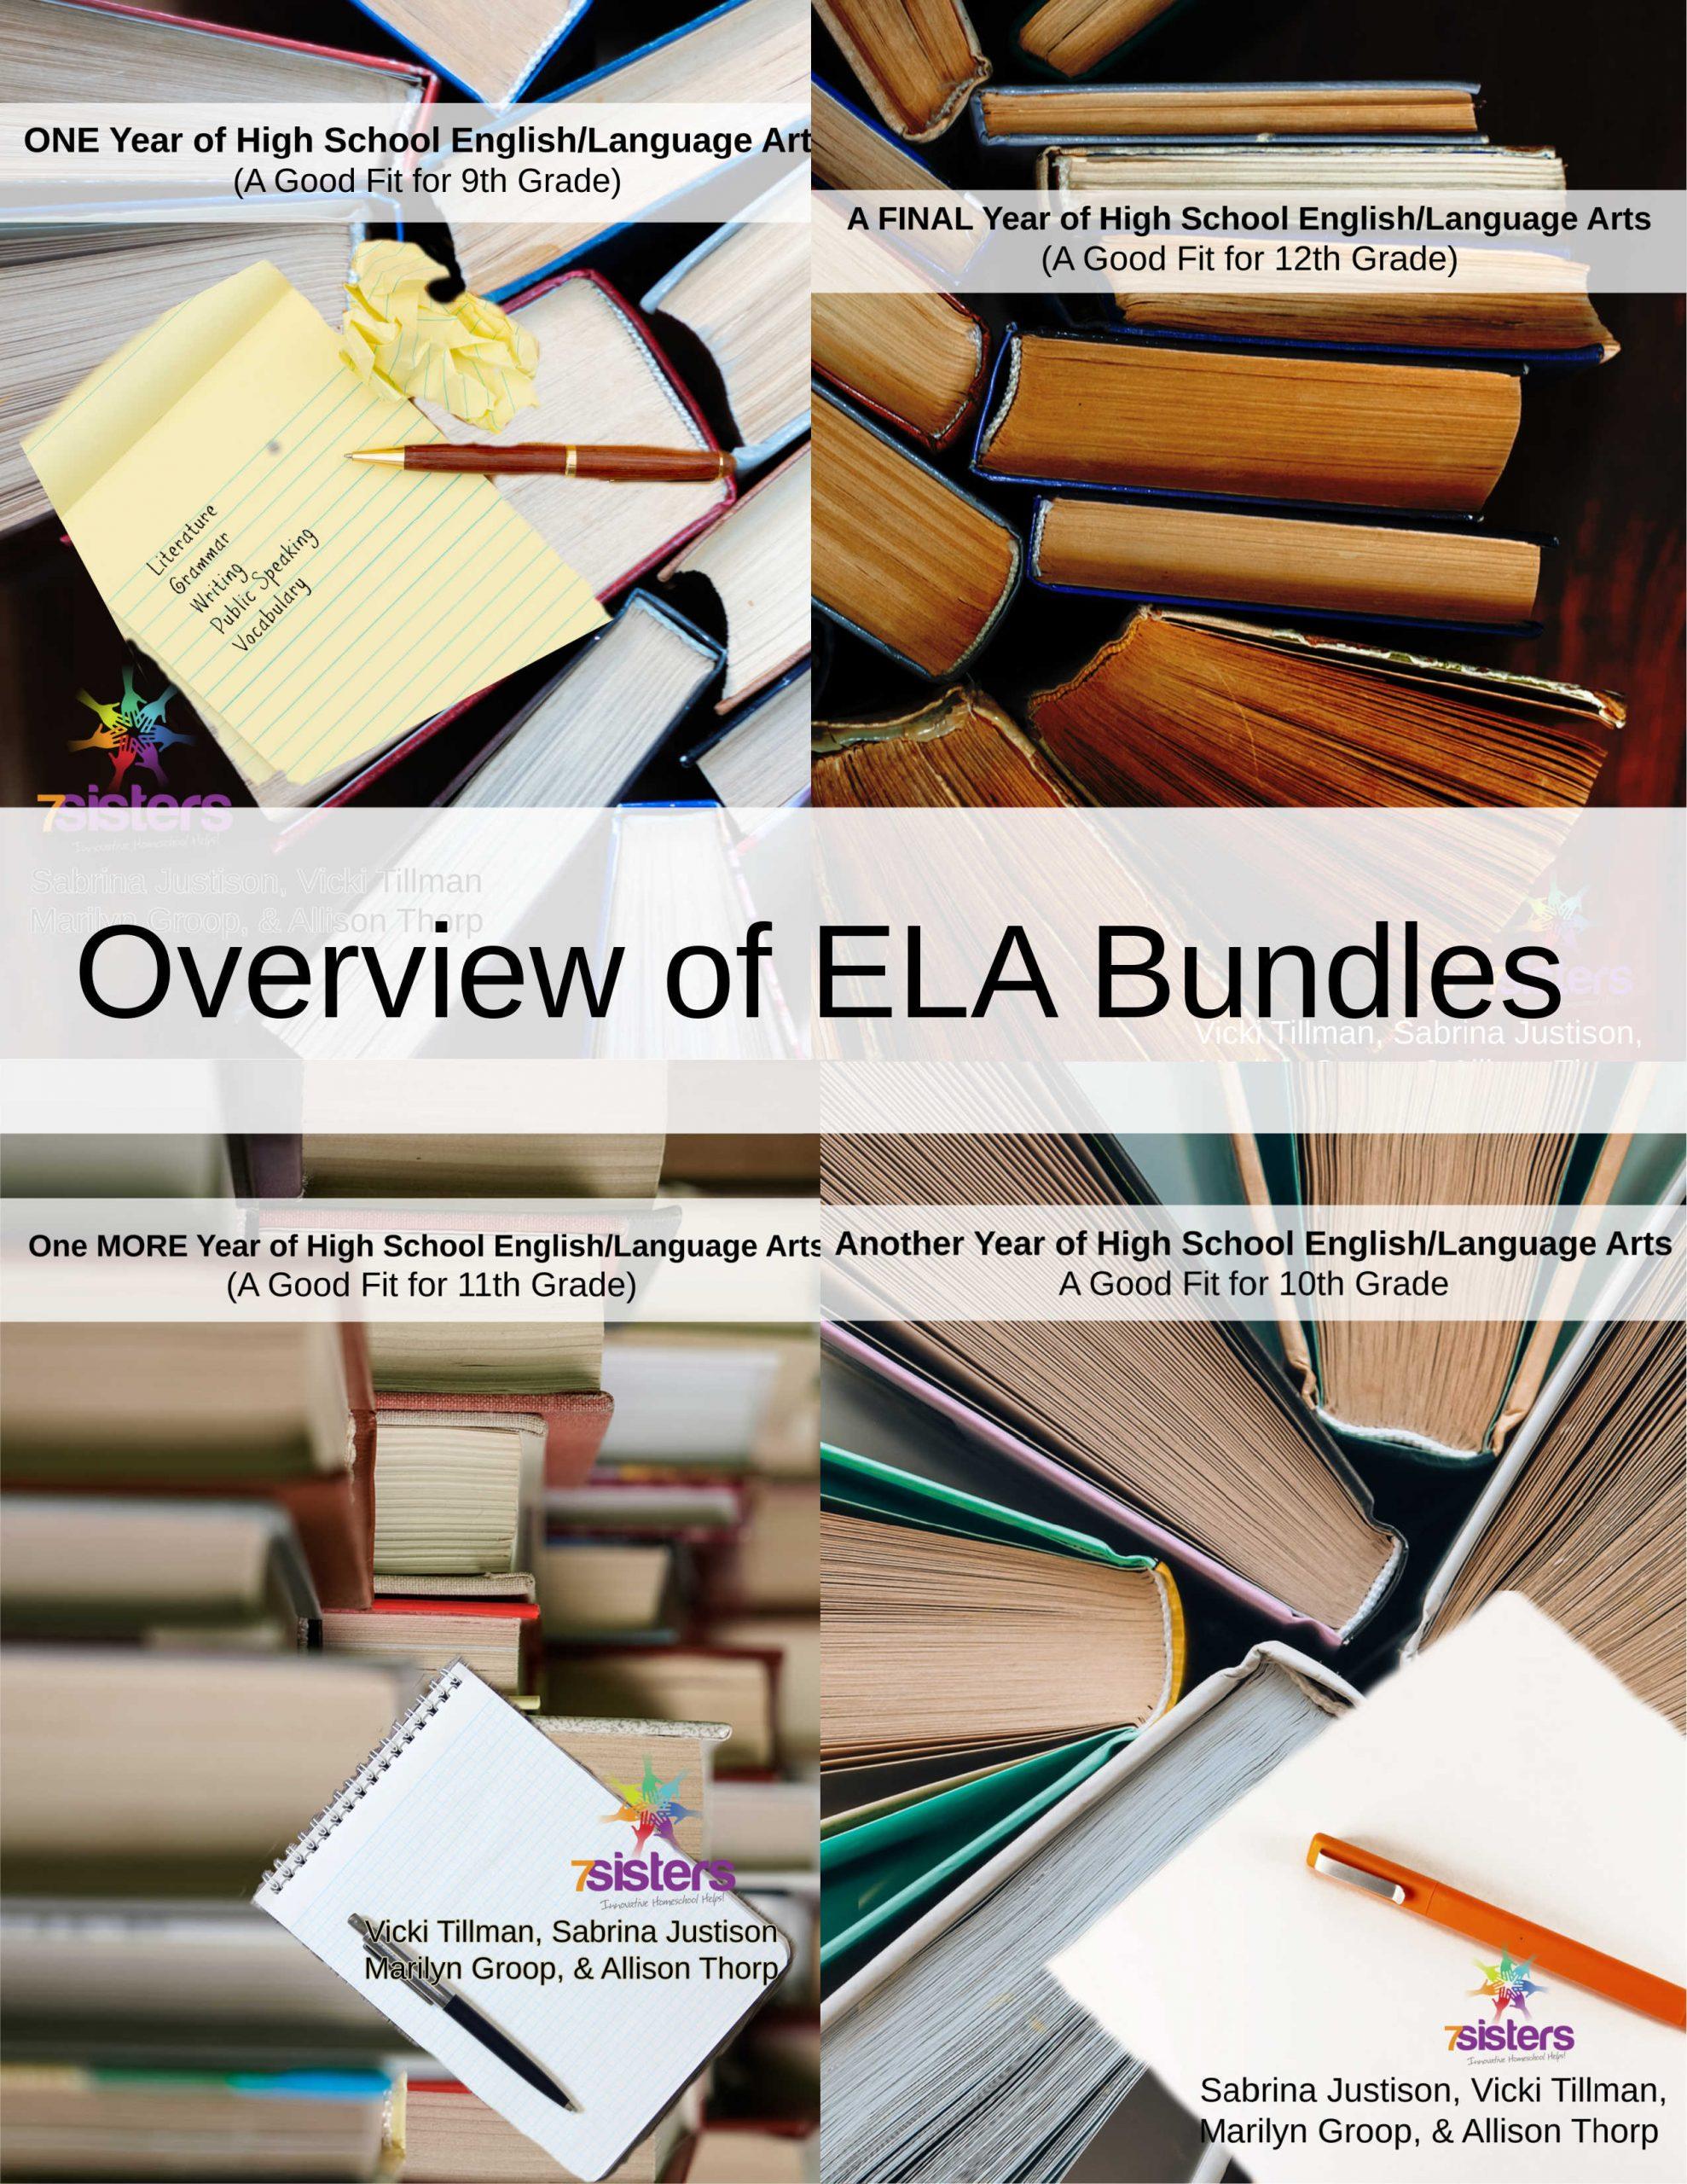 Overview of ELA Bundles 7SistersHomeschool.com